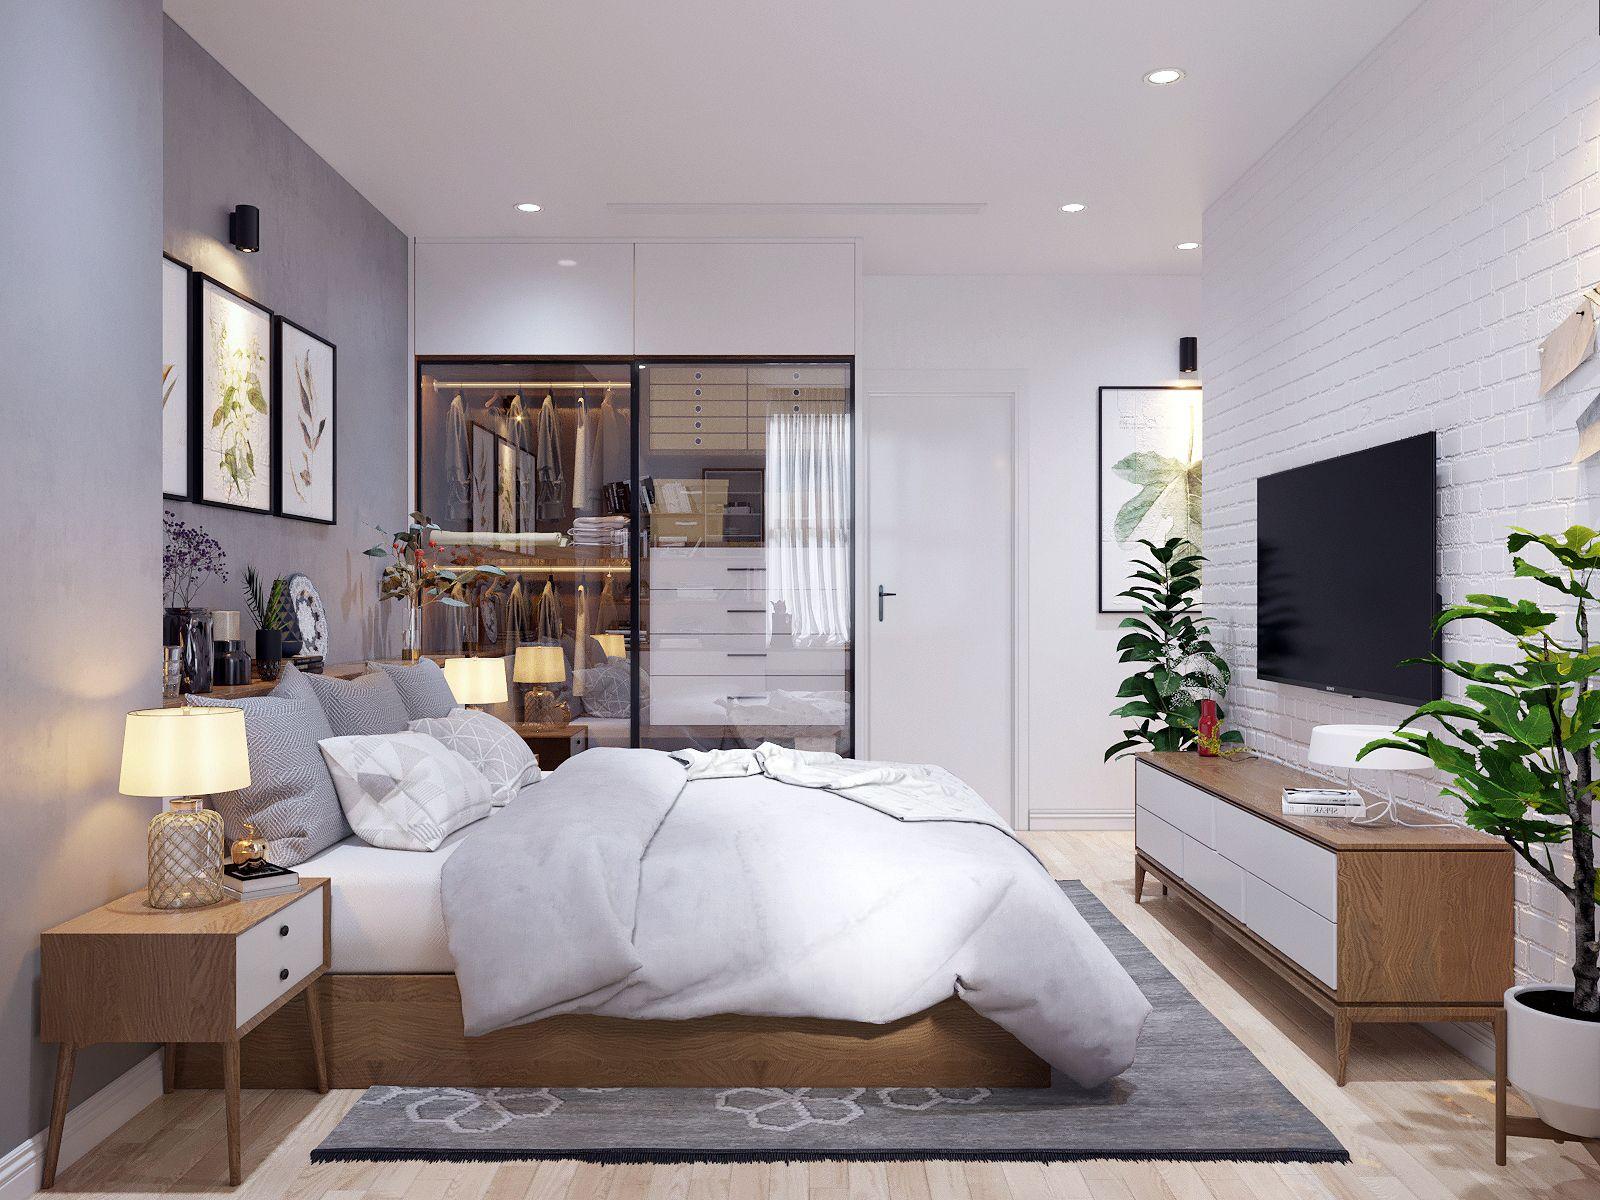 Modern Scandinavian Style Home Design In 2020 Scandinavian Style Home Home Decor Bedroom Bedroom Interior